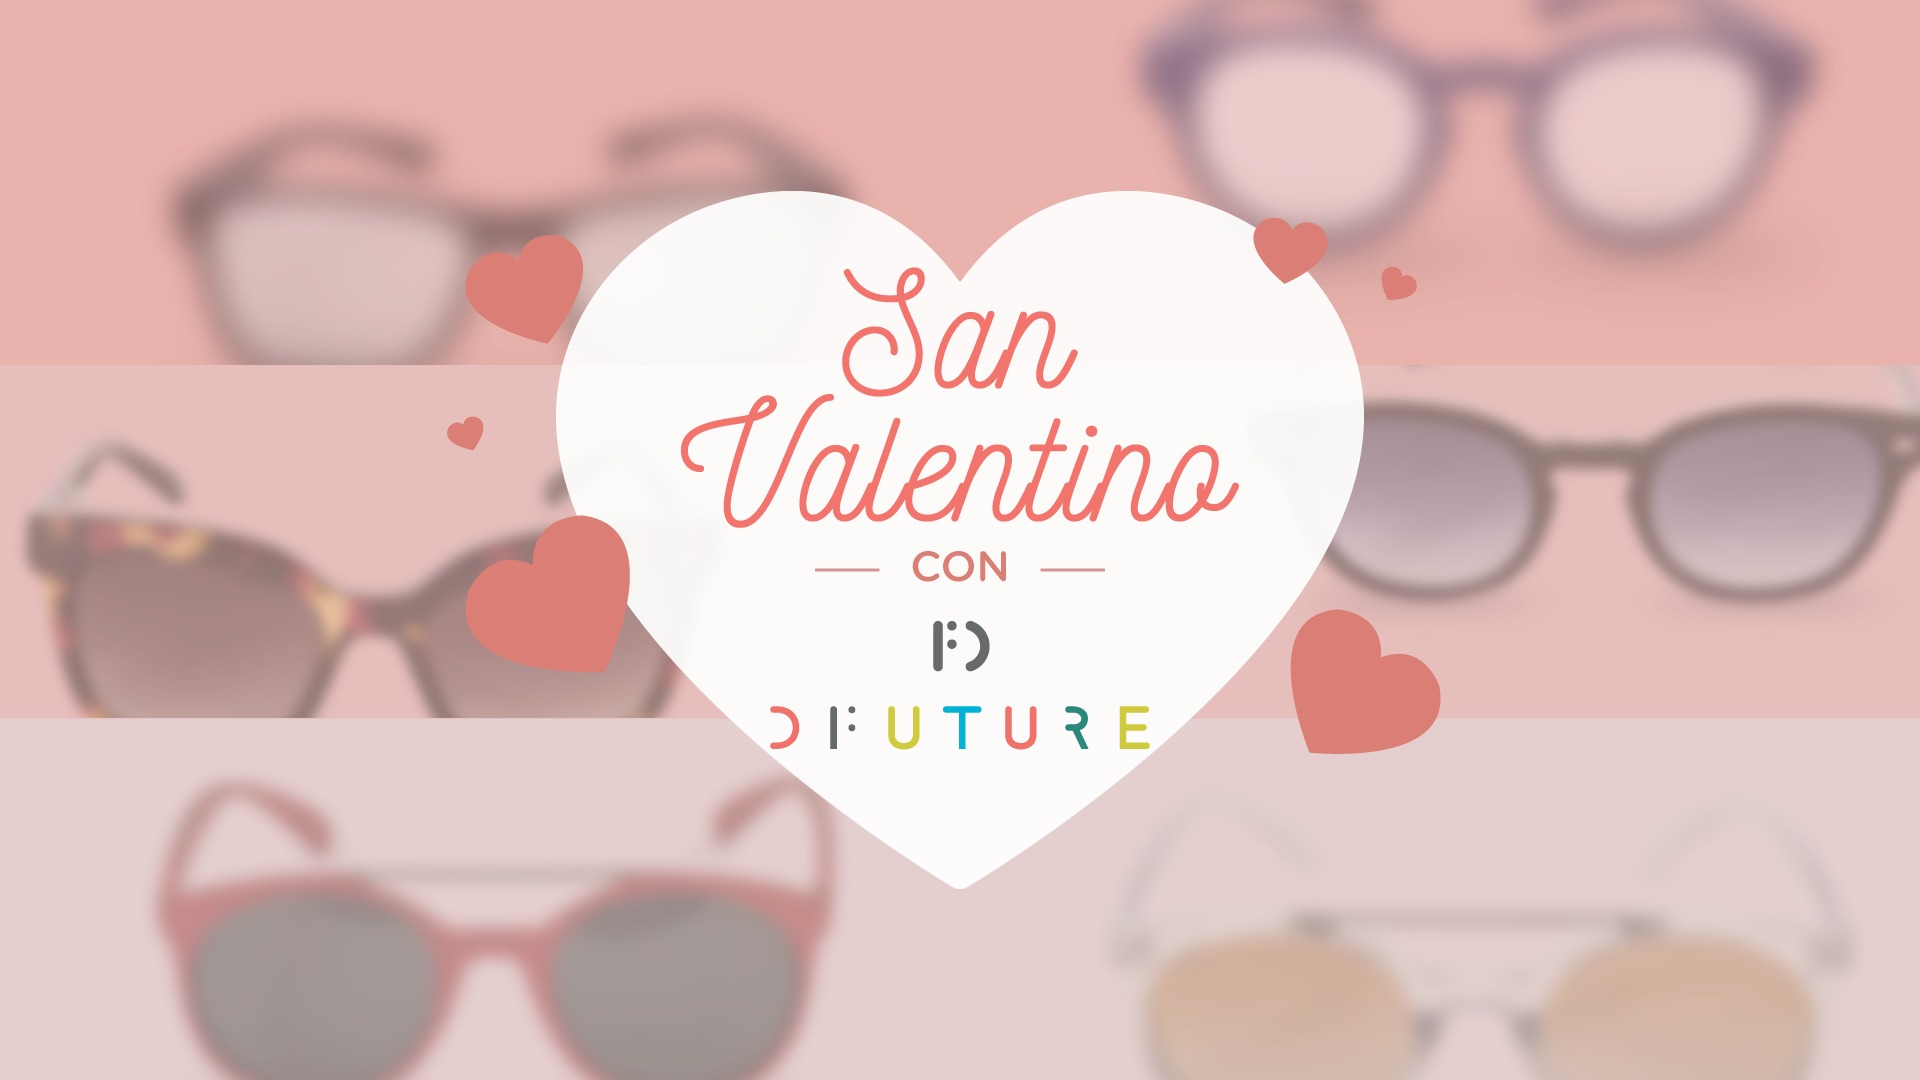 dfuture san valentino